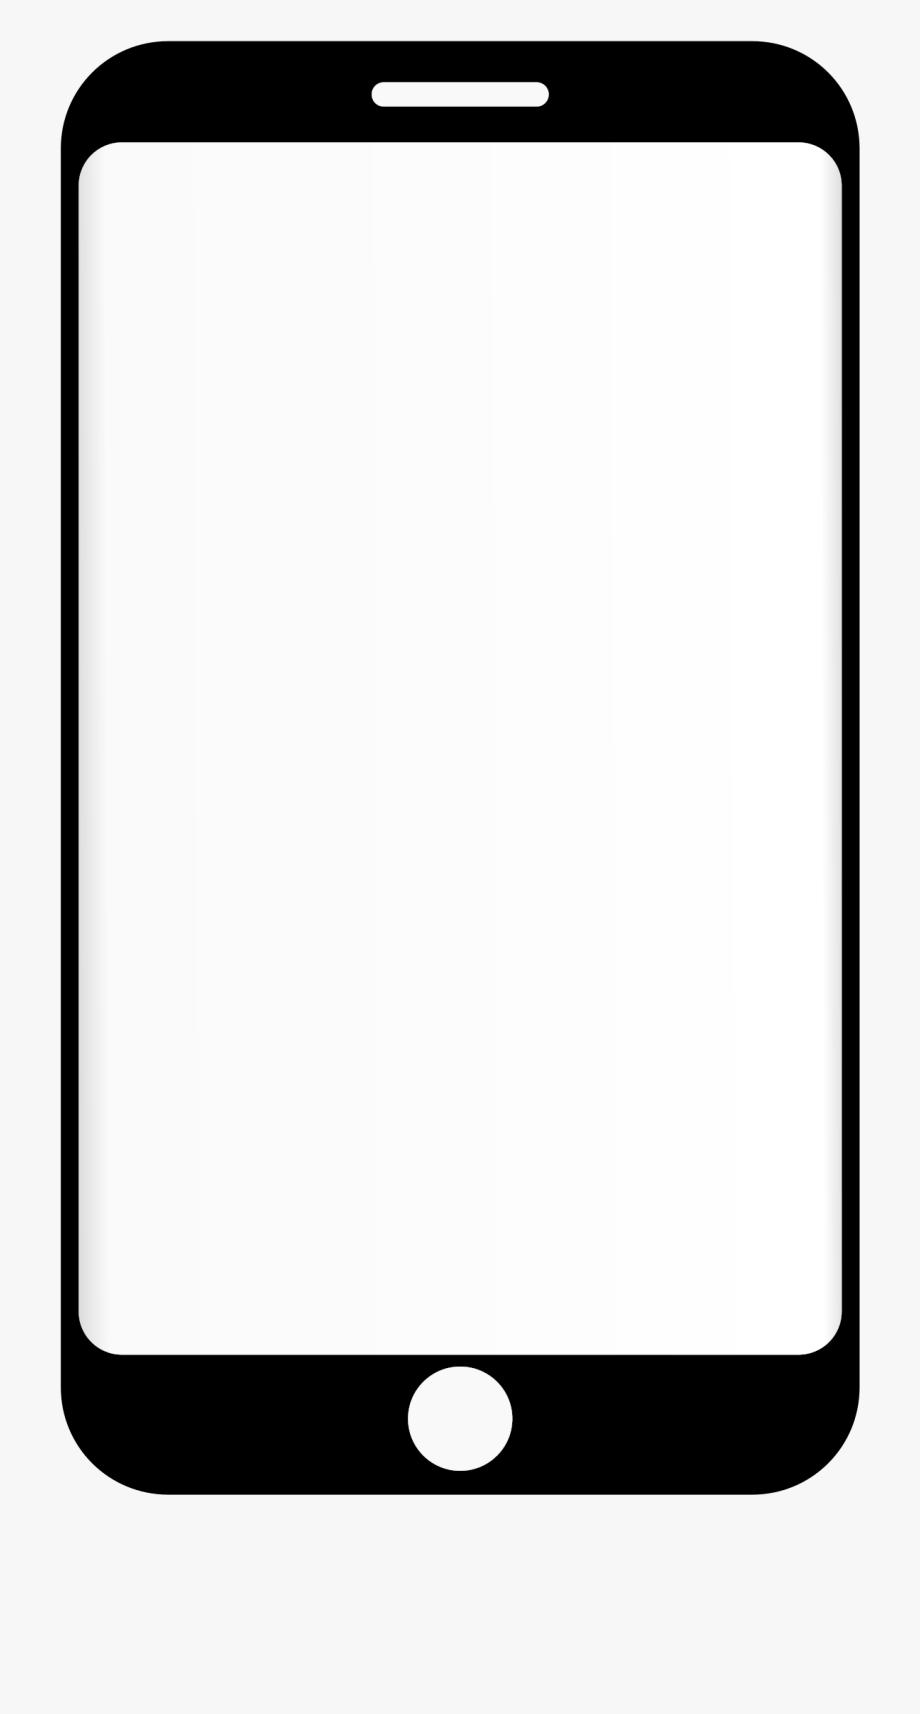 Phone Clipart Phone Android Phone Phone Android Transparent Free For Download On Webstockreview 2021